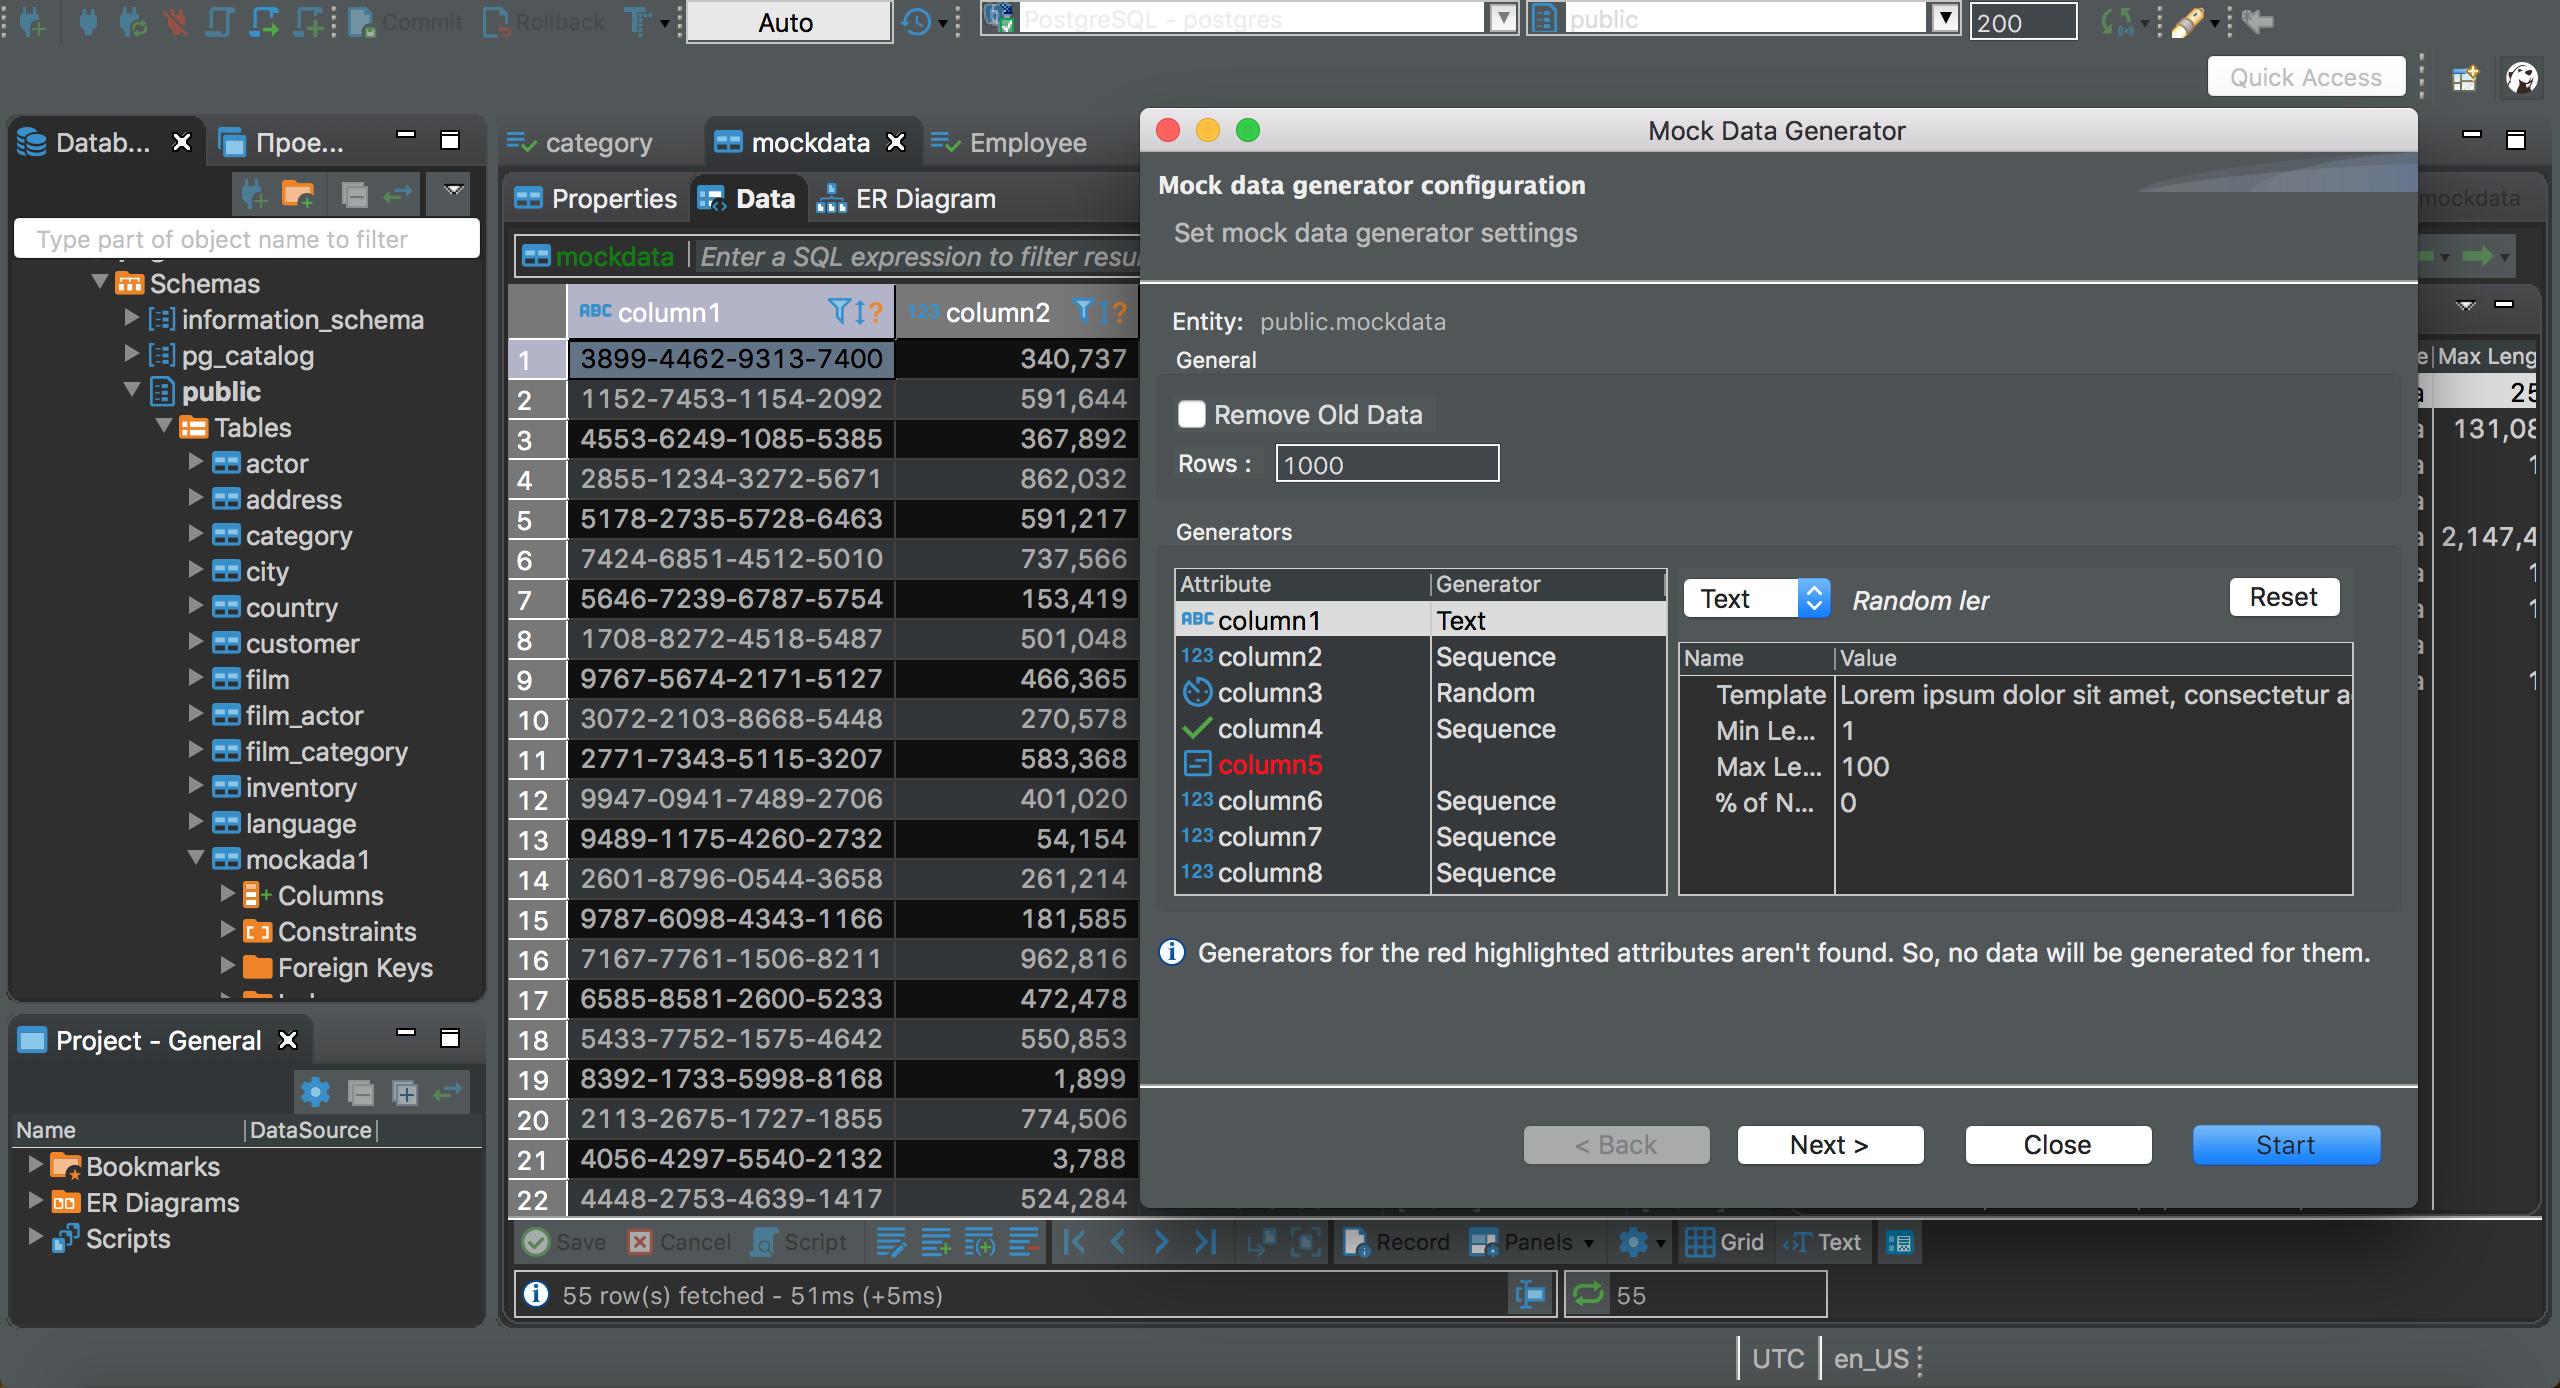 GitHub - dbeaver/dbeaver: Free universal database tool and SQL client